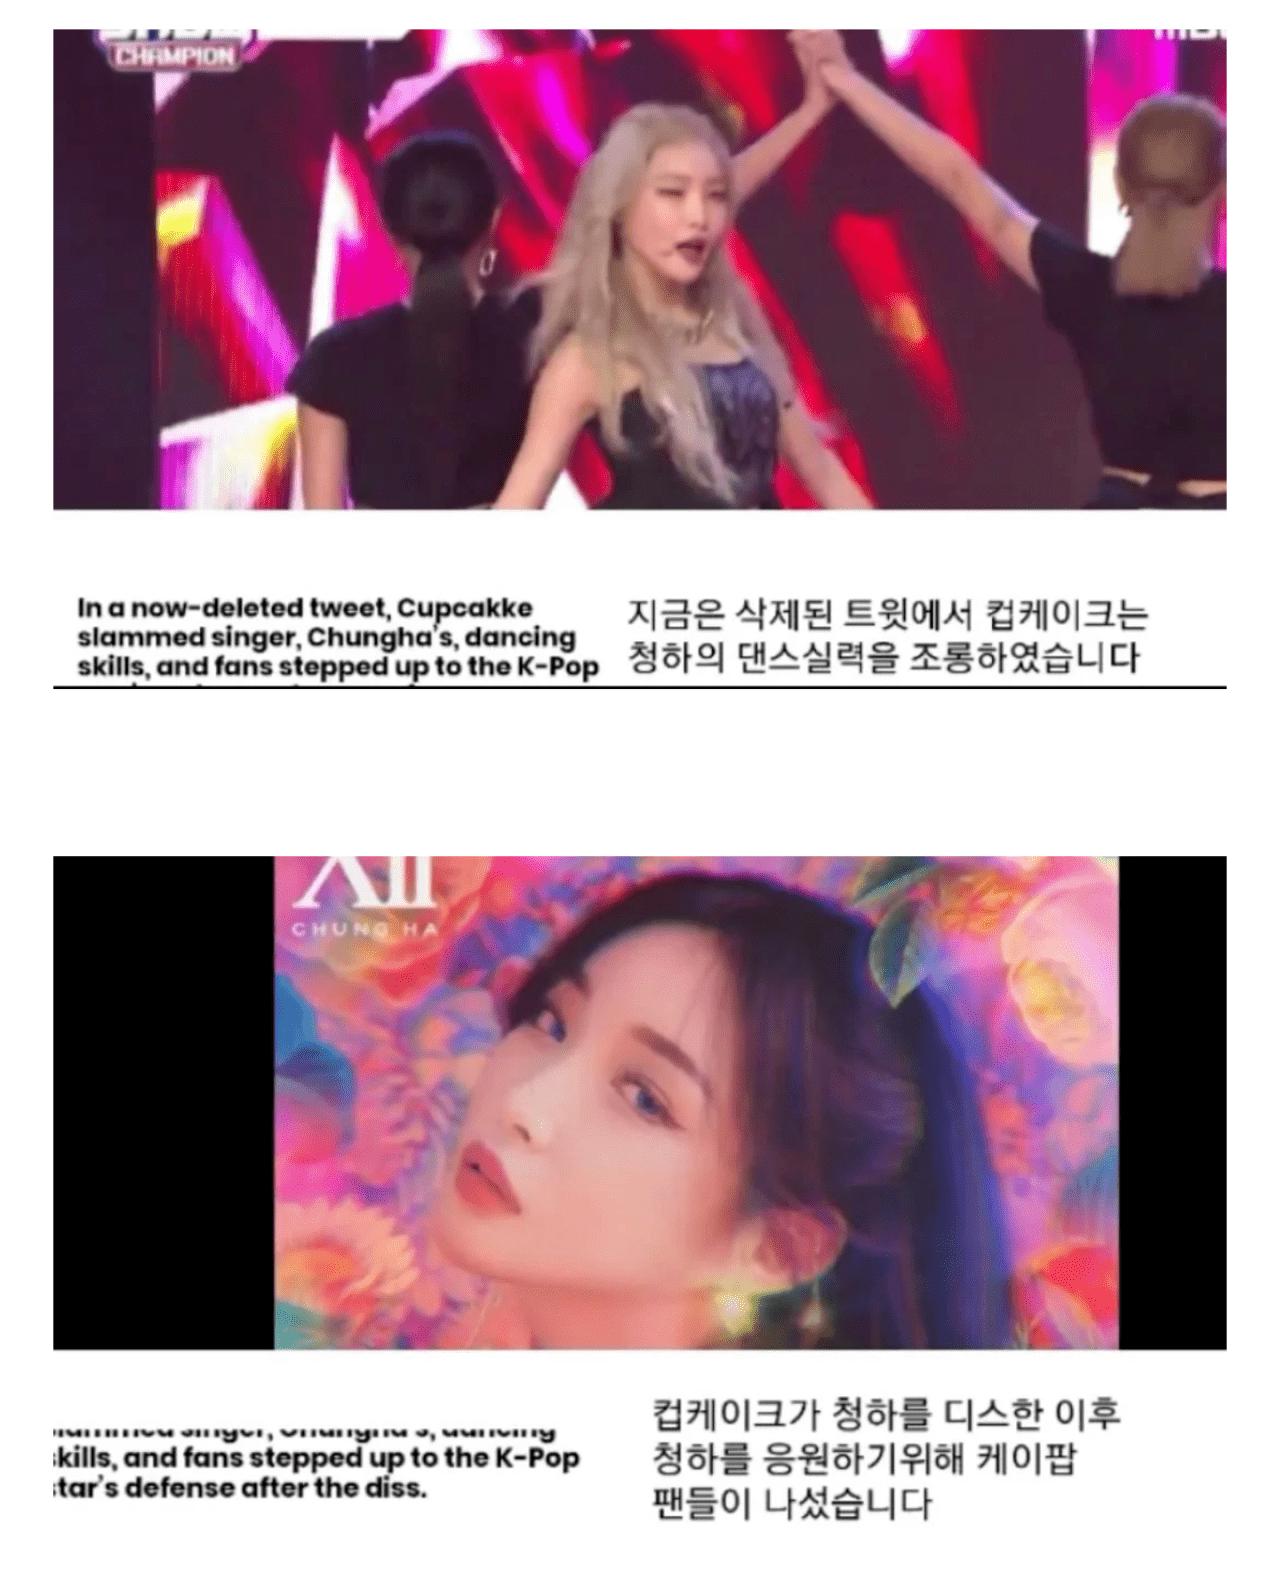 Screenshot_20191010-170505(1).png 혐) 미국 래퍼에게 춤 못춘다고 디스당한 청하